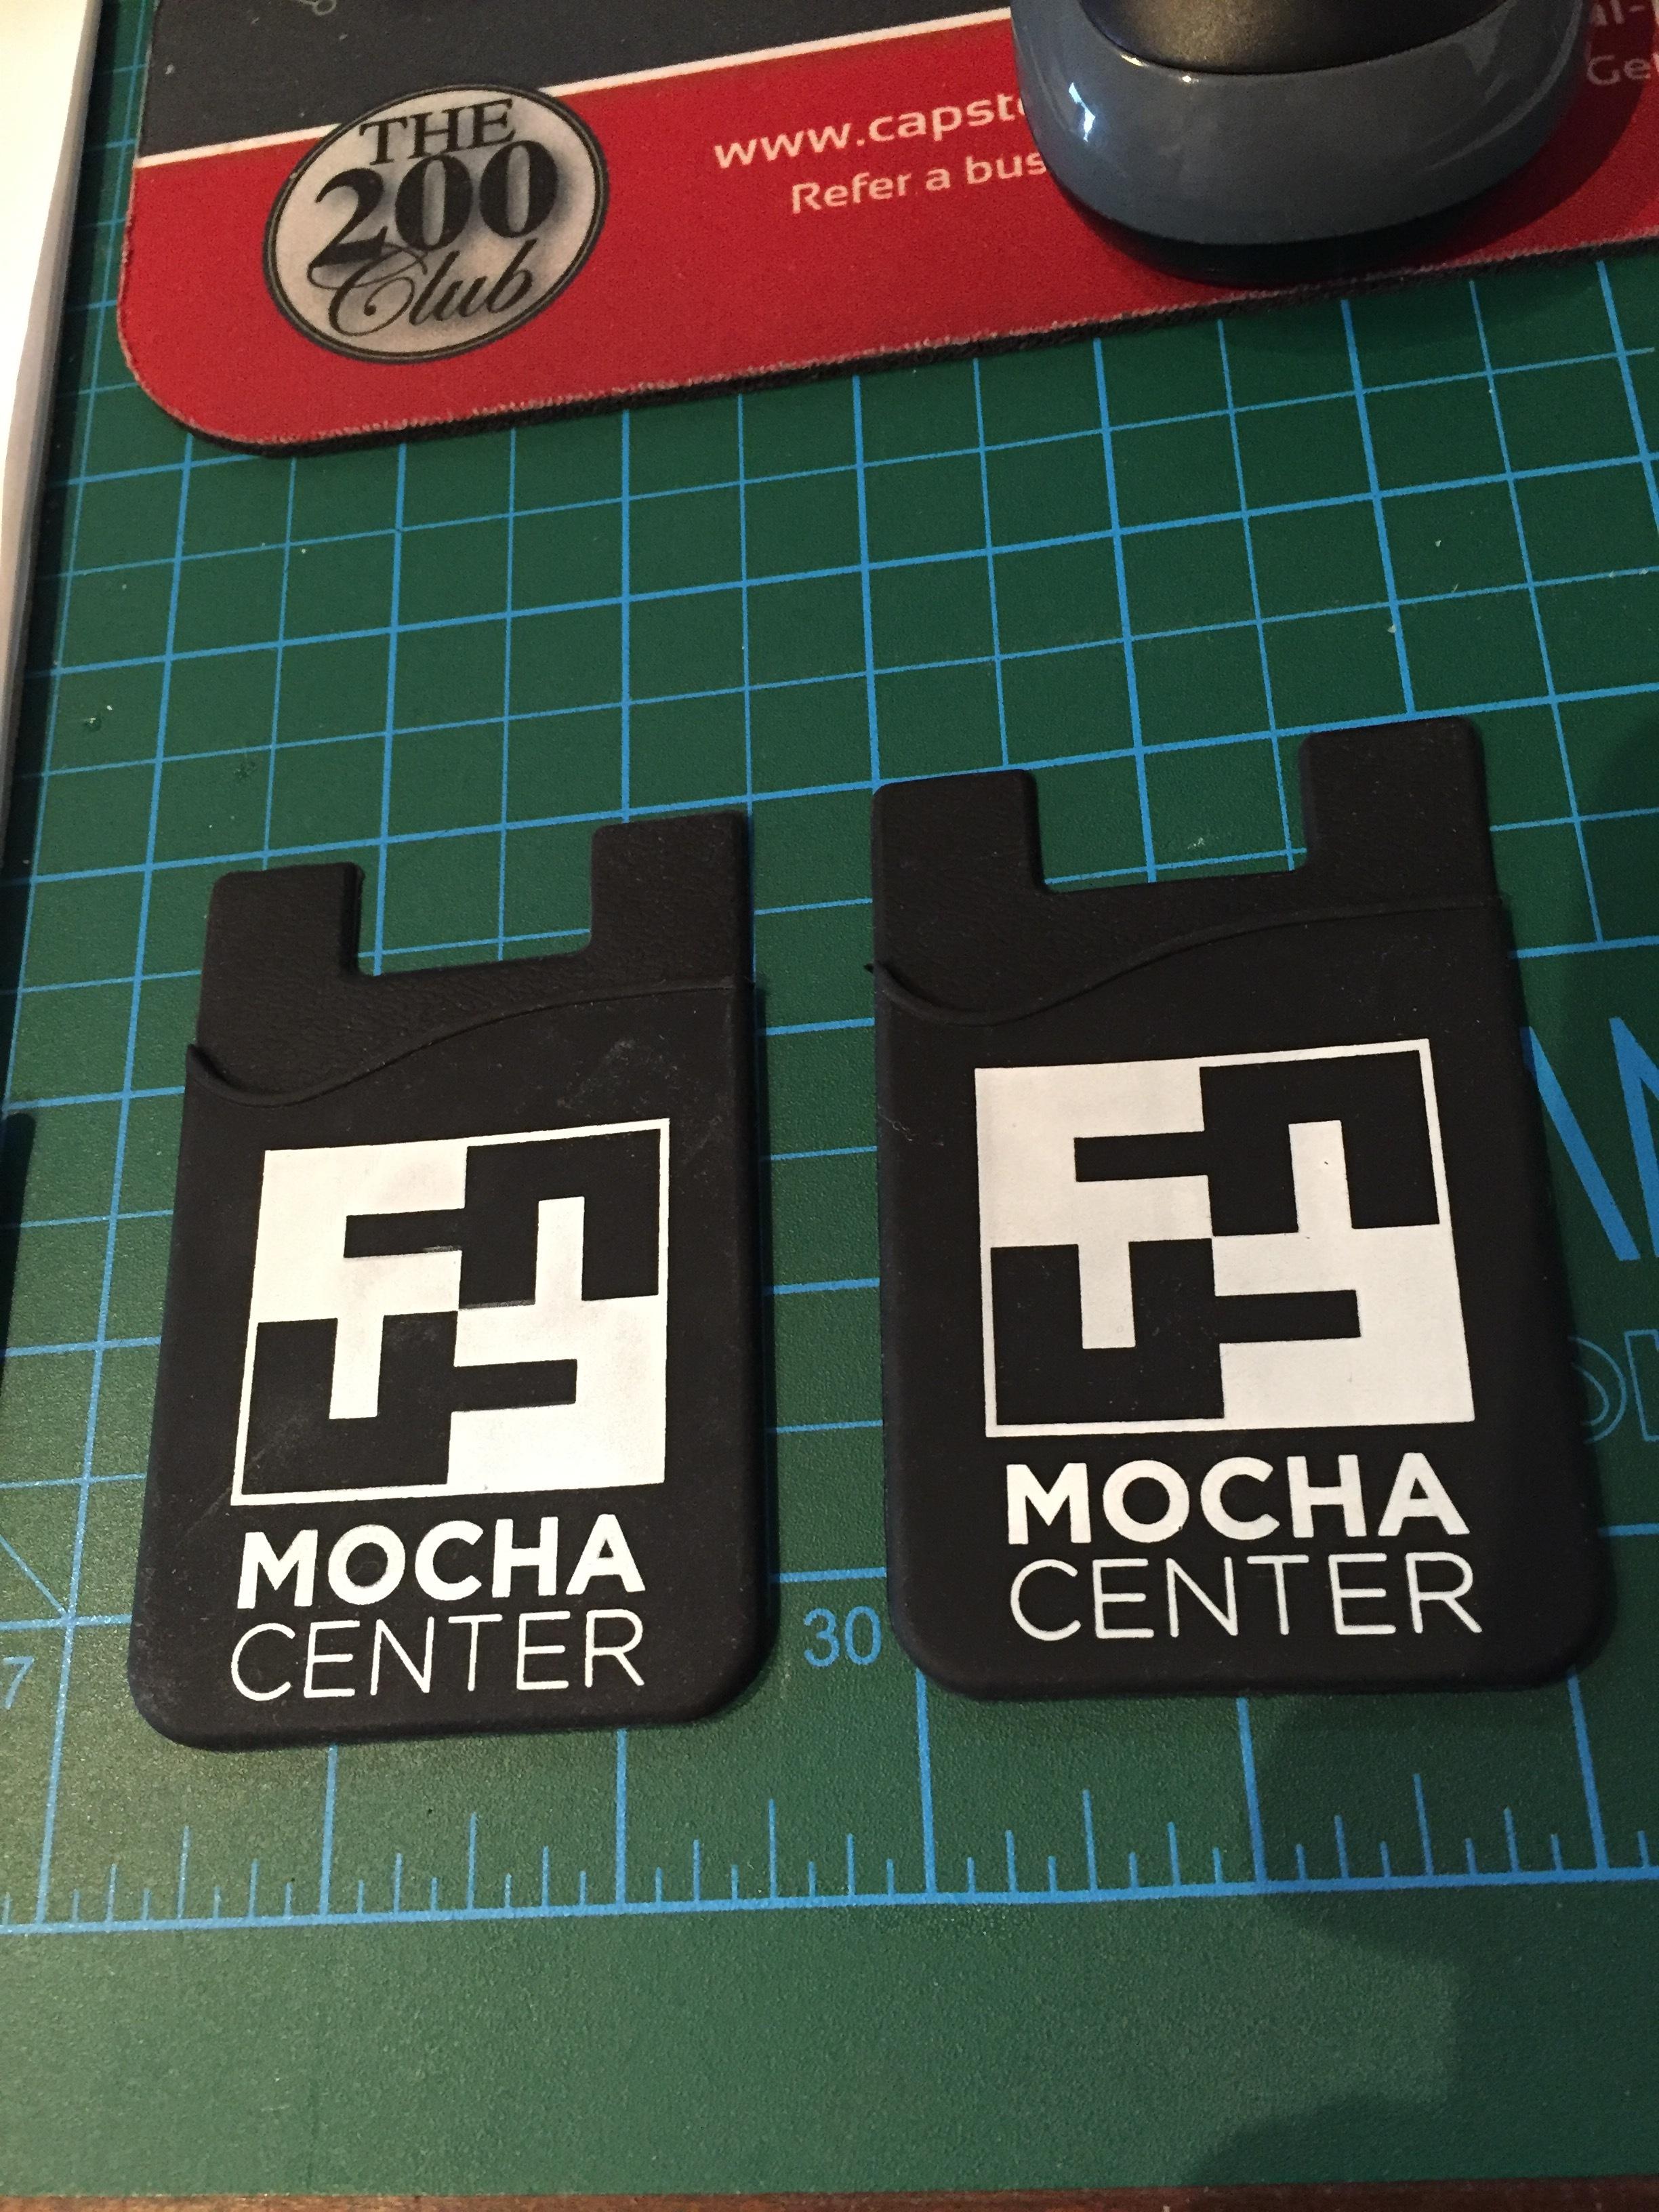 Mocha Center